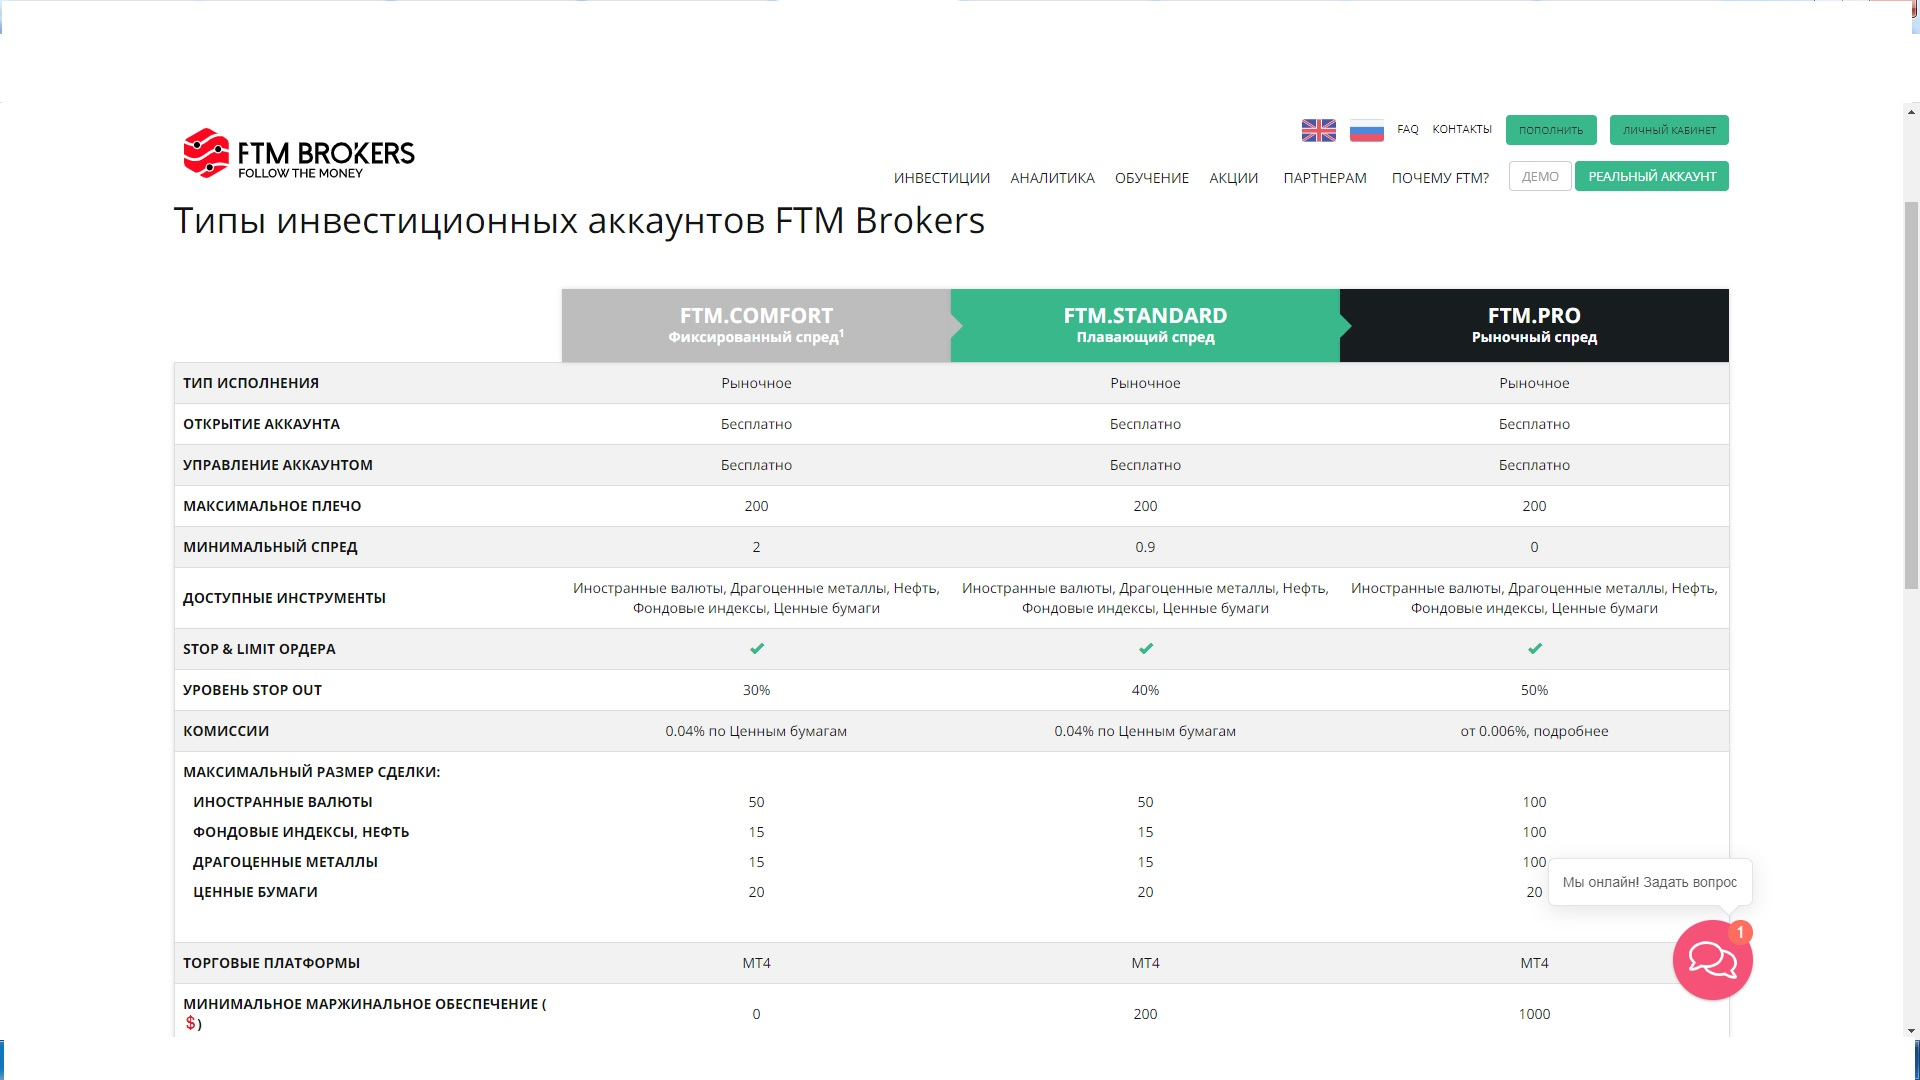 Типы аккаунтов «ФТМ брокерс»